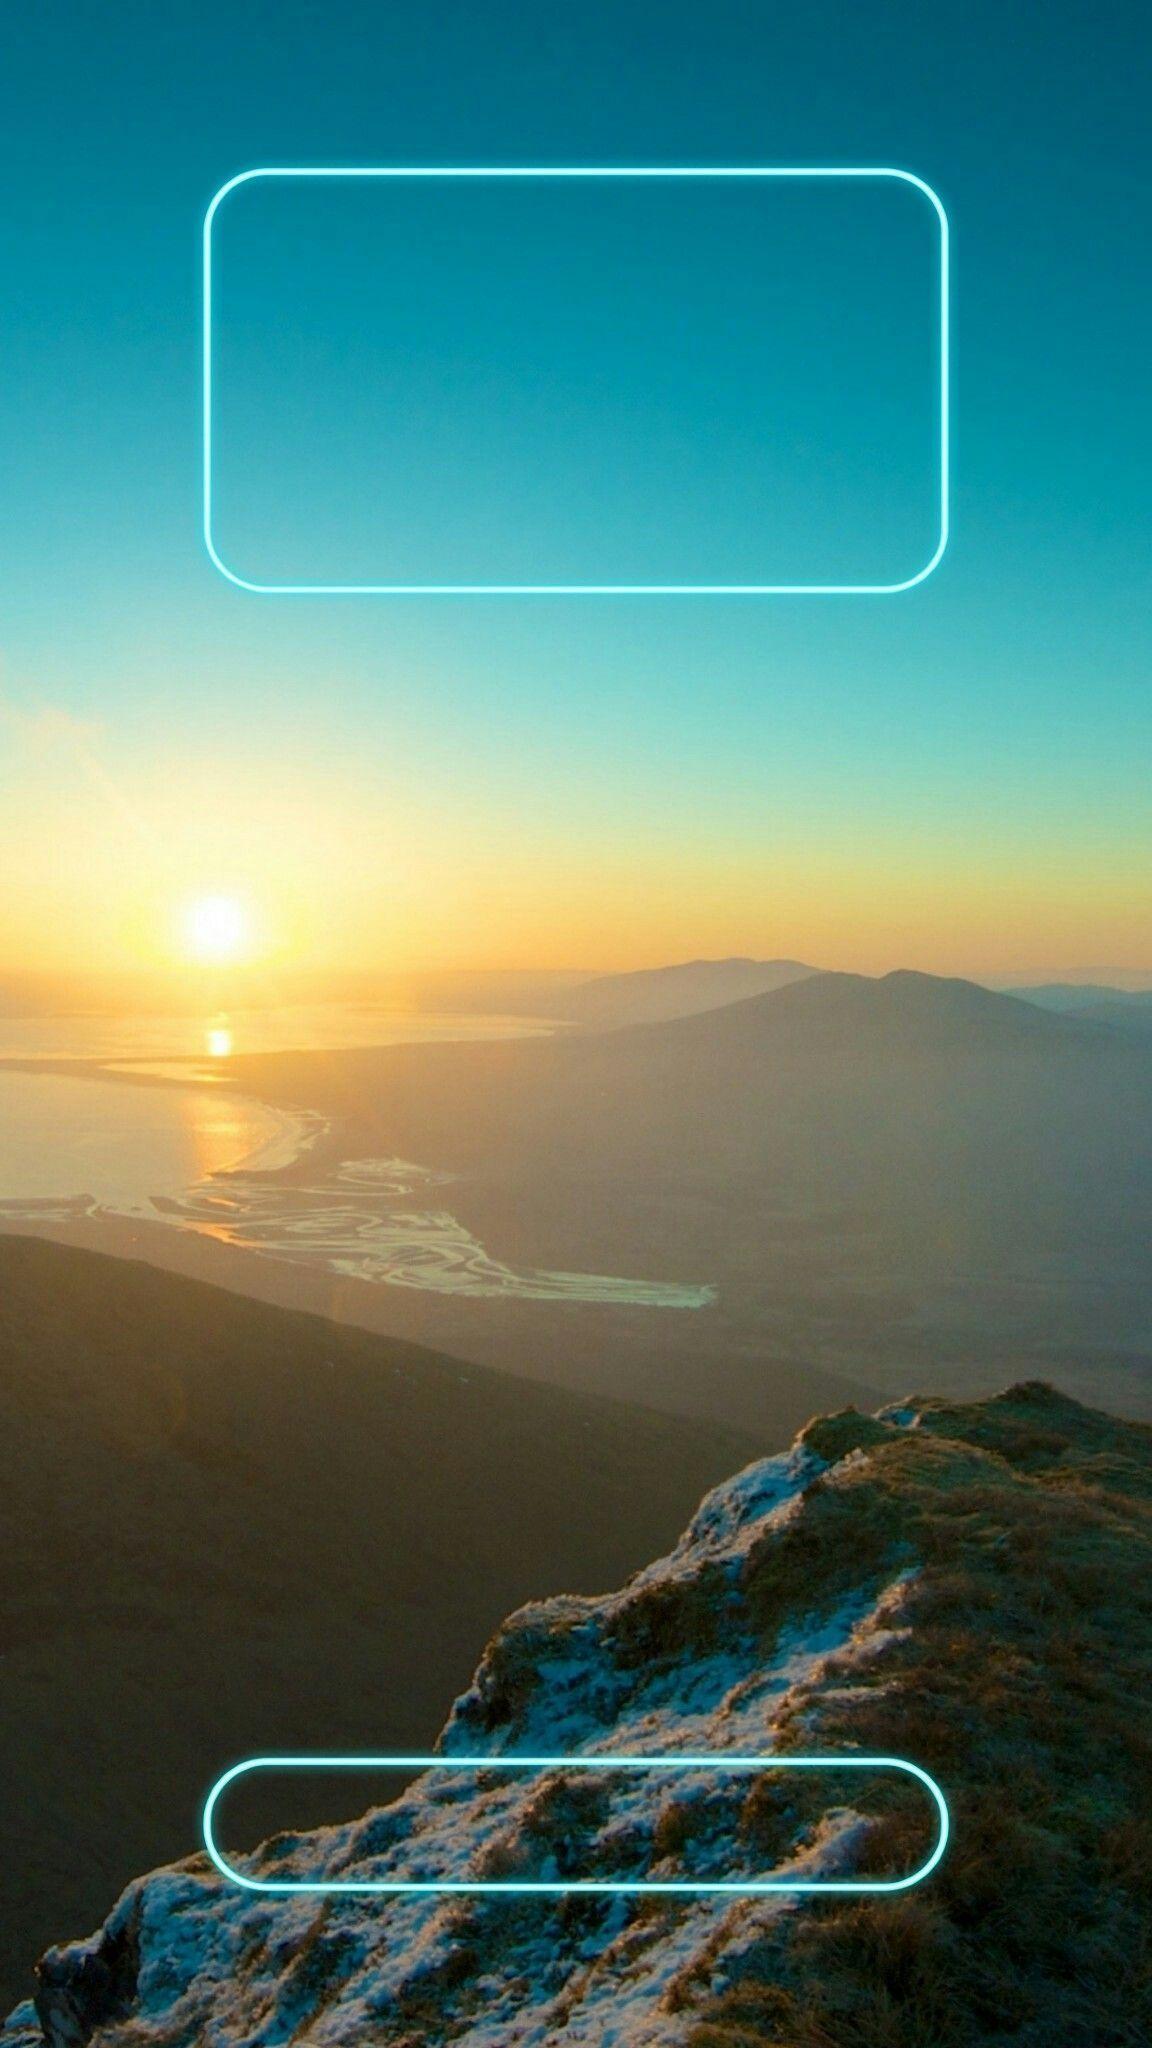 Iphone Homescreen Wallpapers Top Free Iphone Homescreen